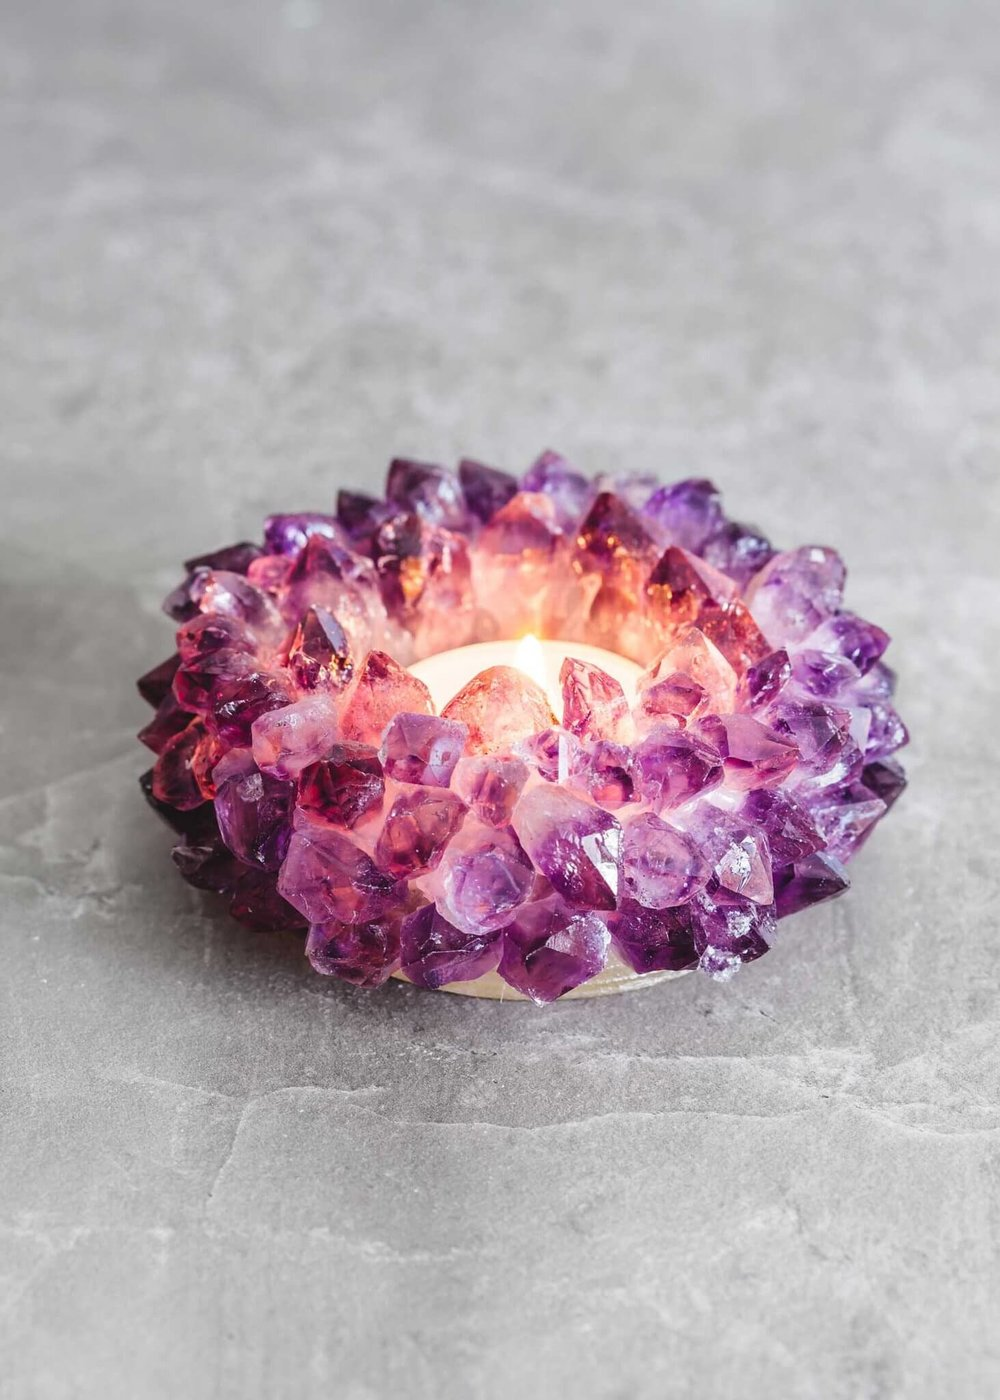 web-1577_Amethyst-Lotus-Candle-Holder-4653.jpg